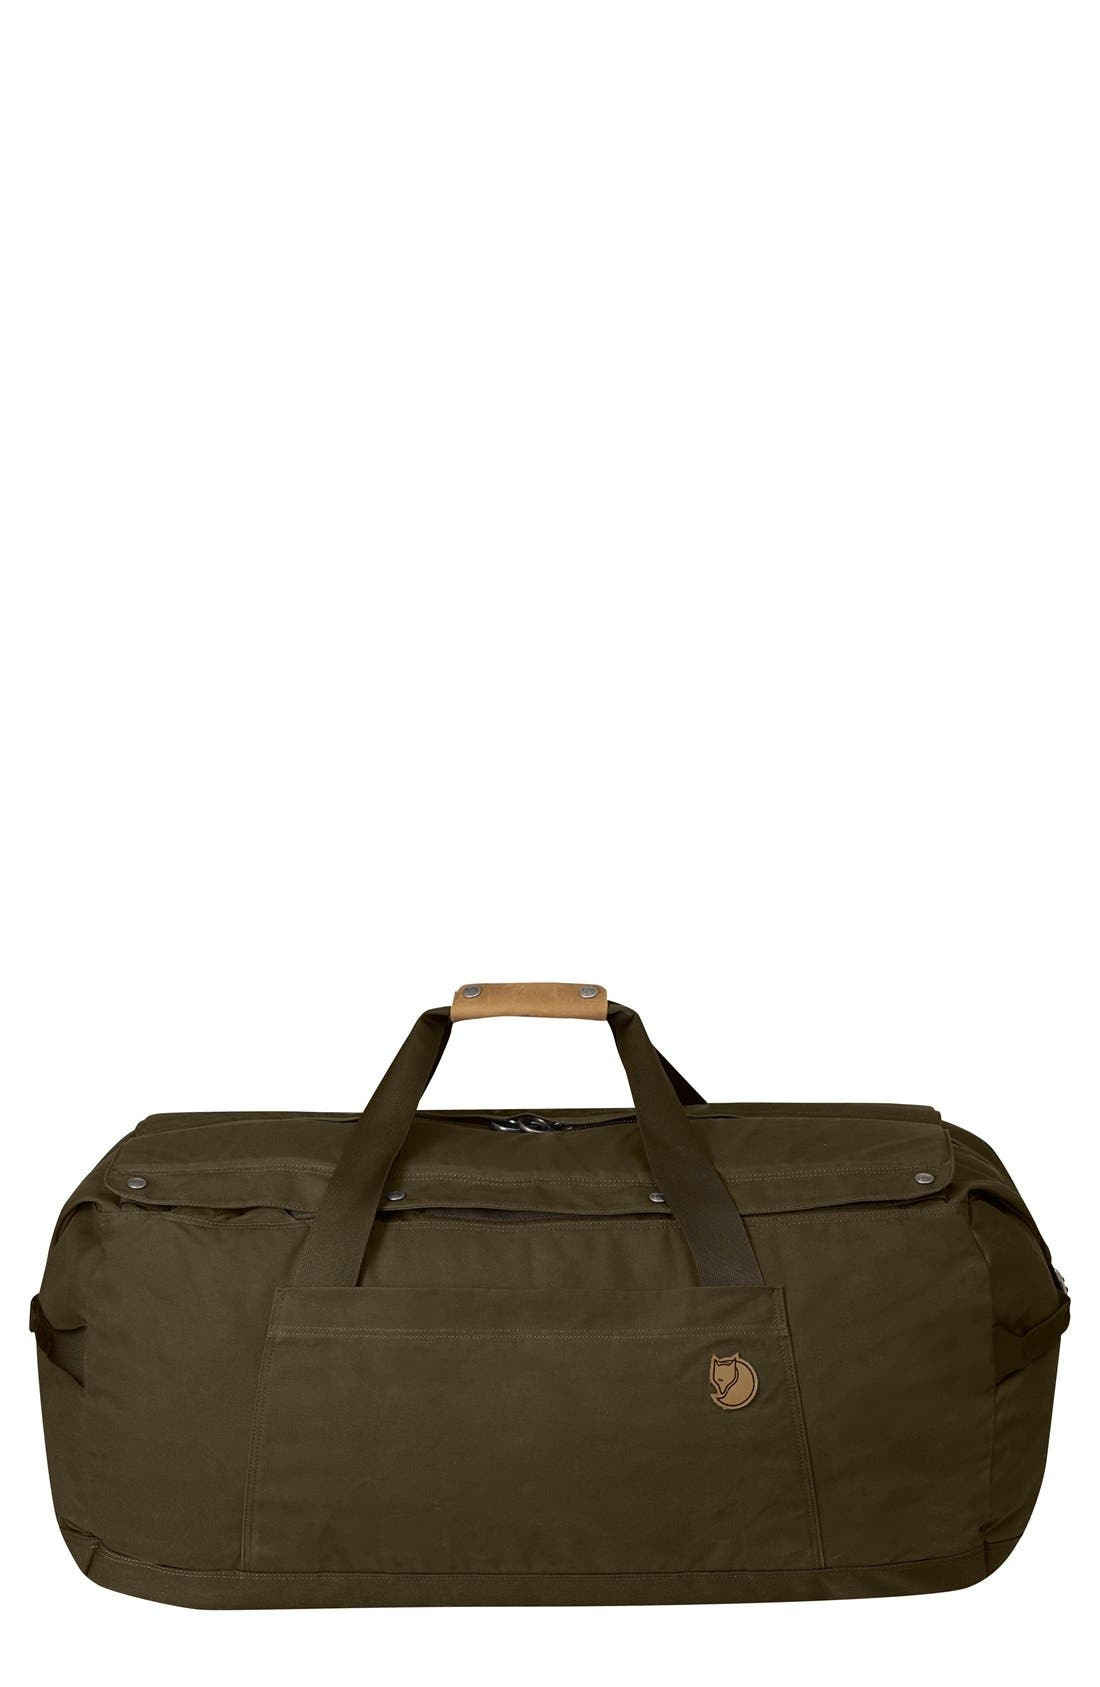 Main Image - Fjällräven 'Duffel Bag No. 6' Large Duffel Bag